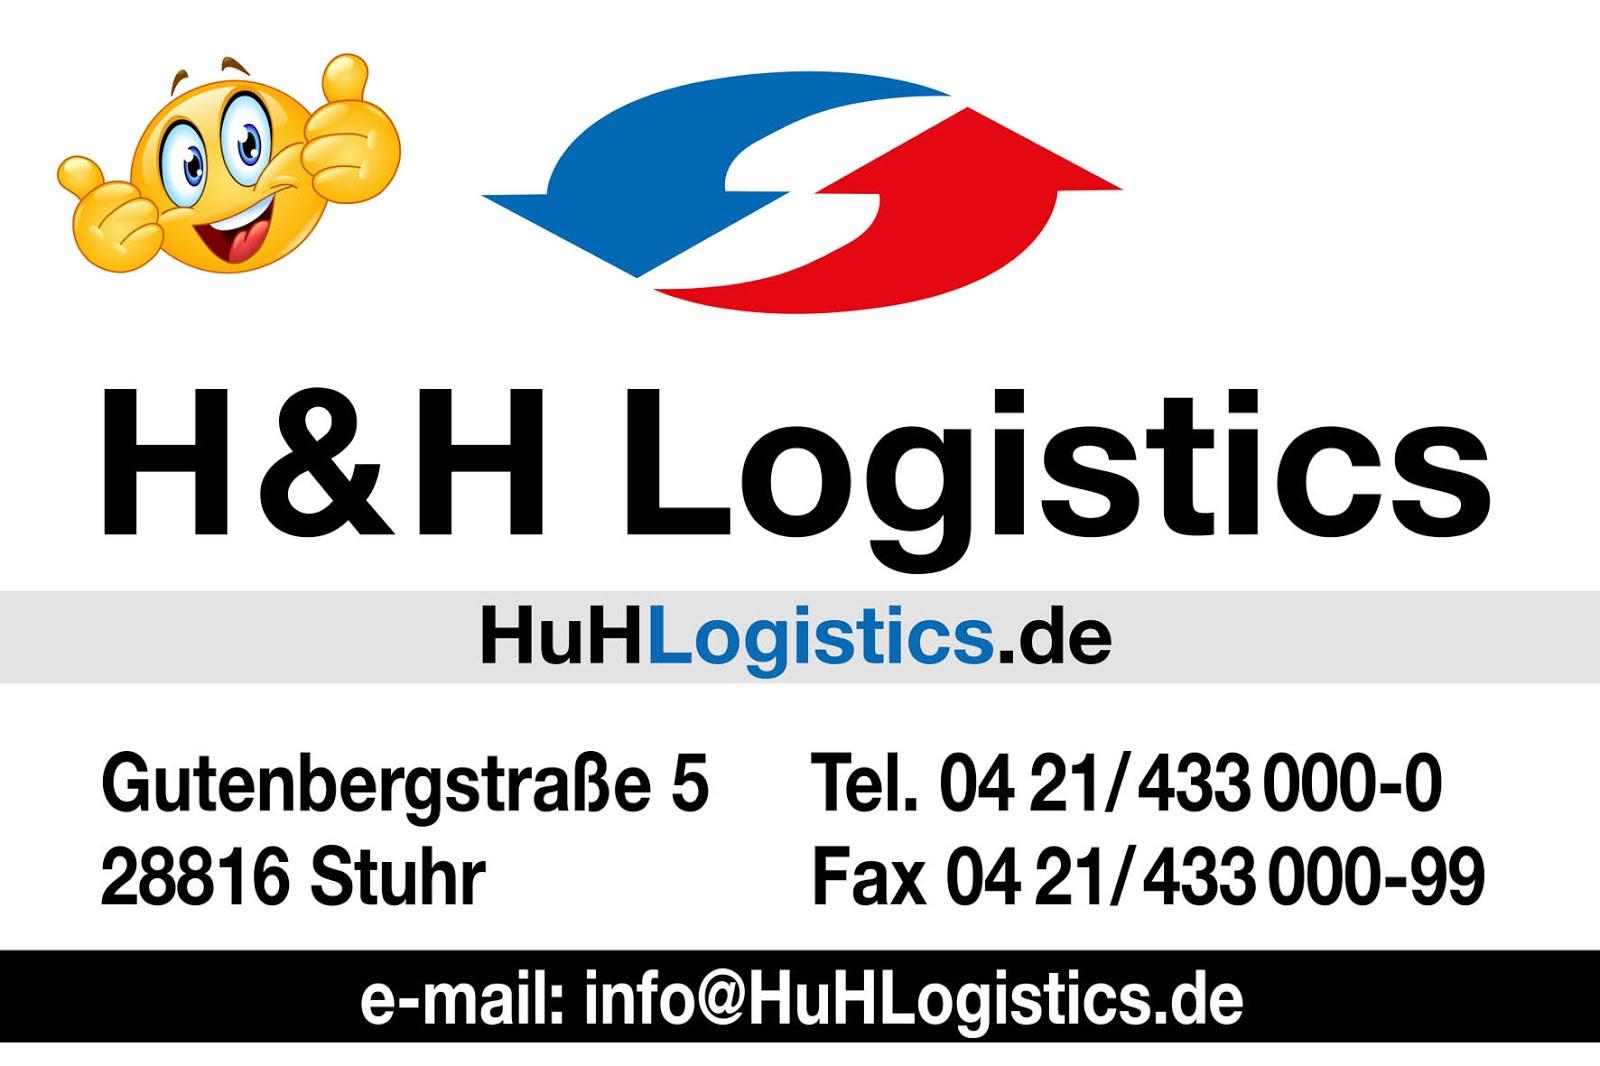 HuH Logistics